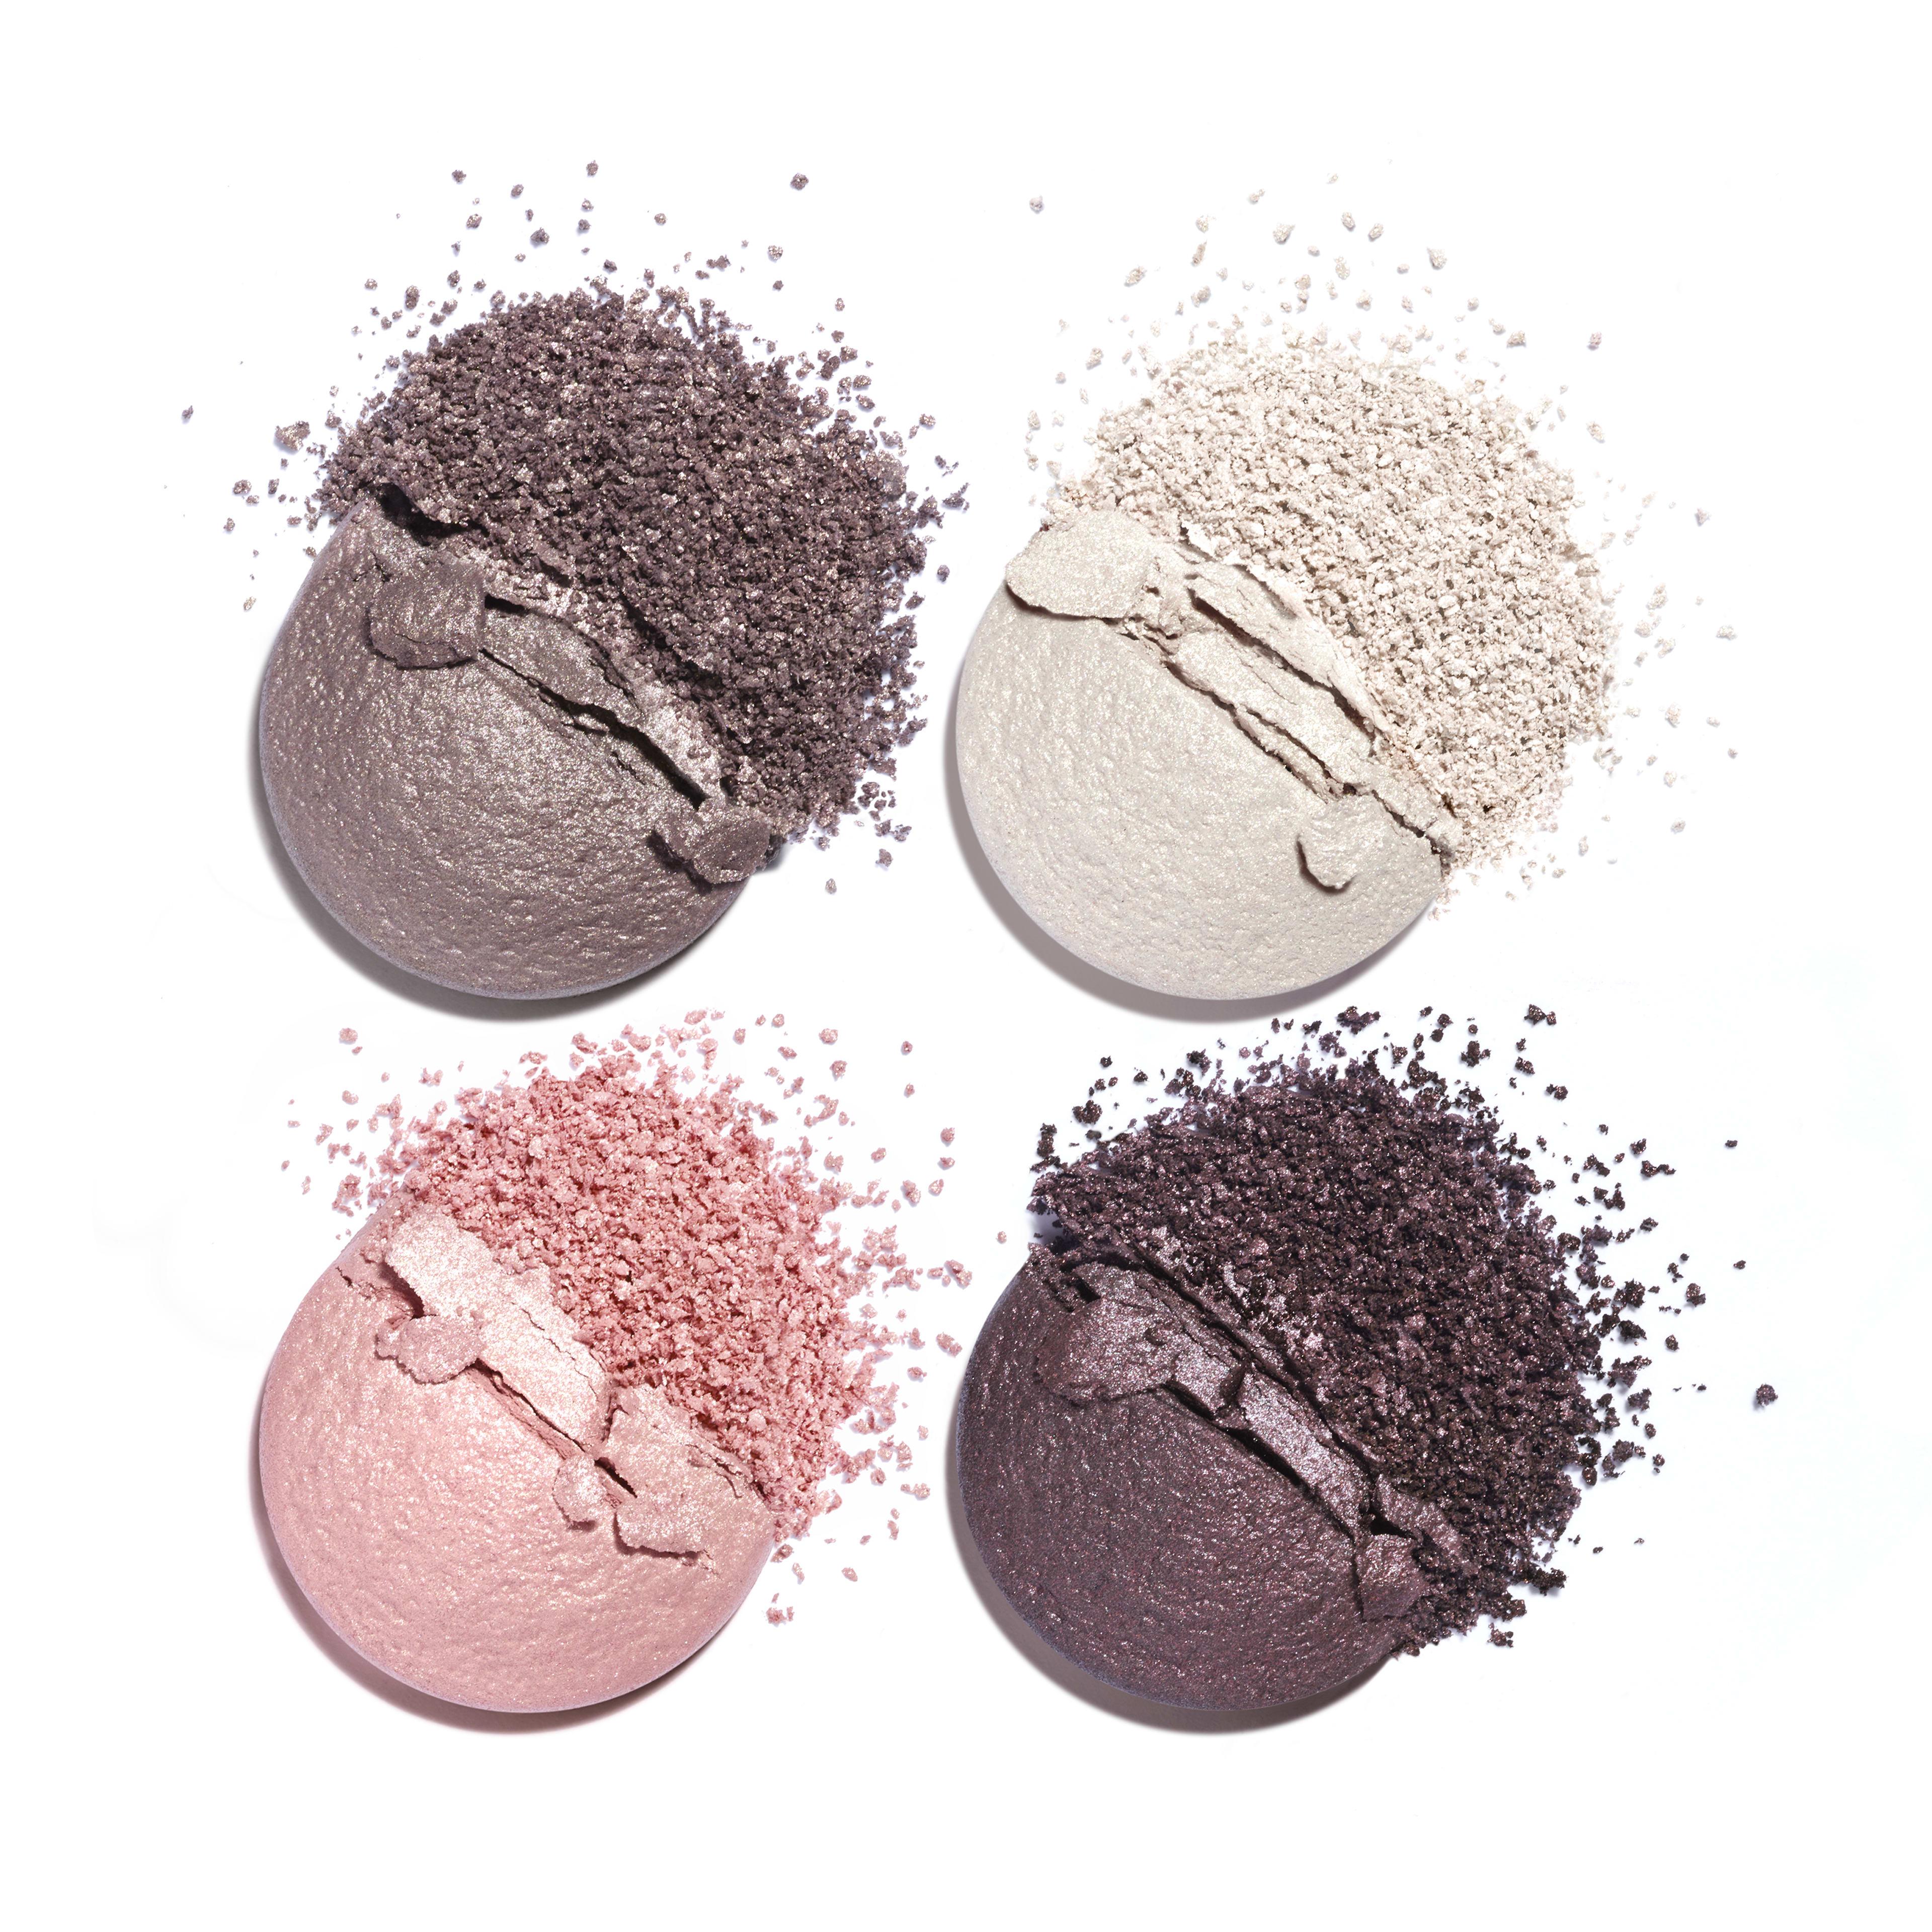 LES 4 OMBRES  - makeup - 2g - Basic texture view